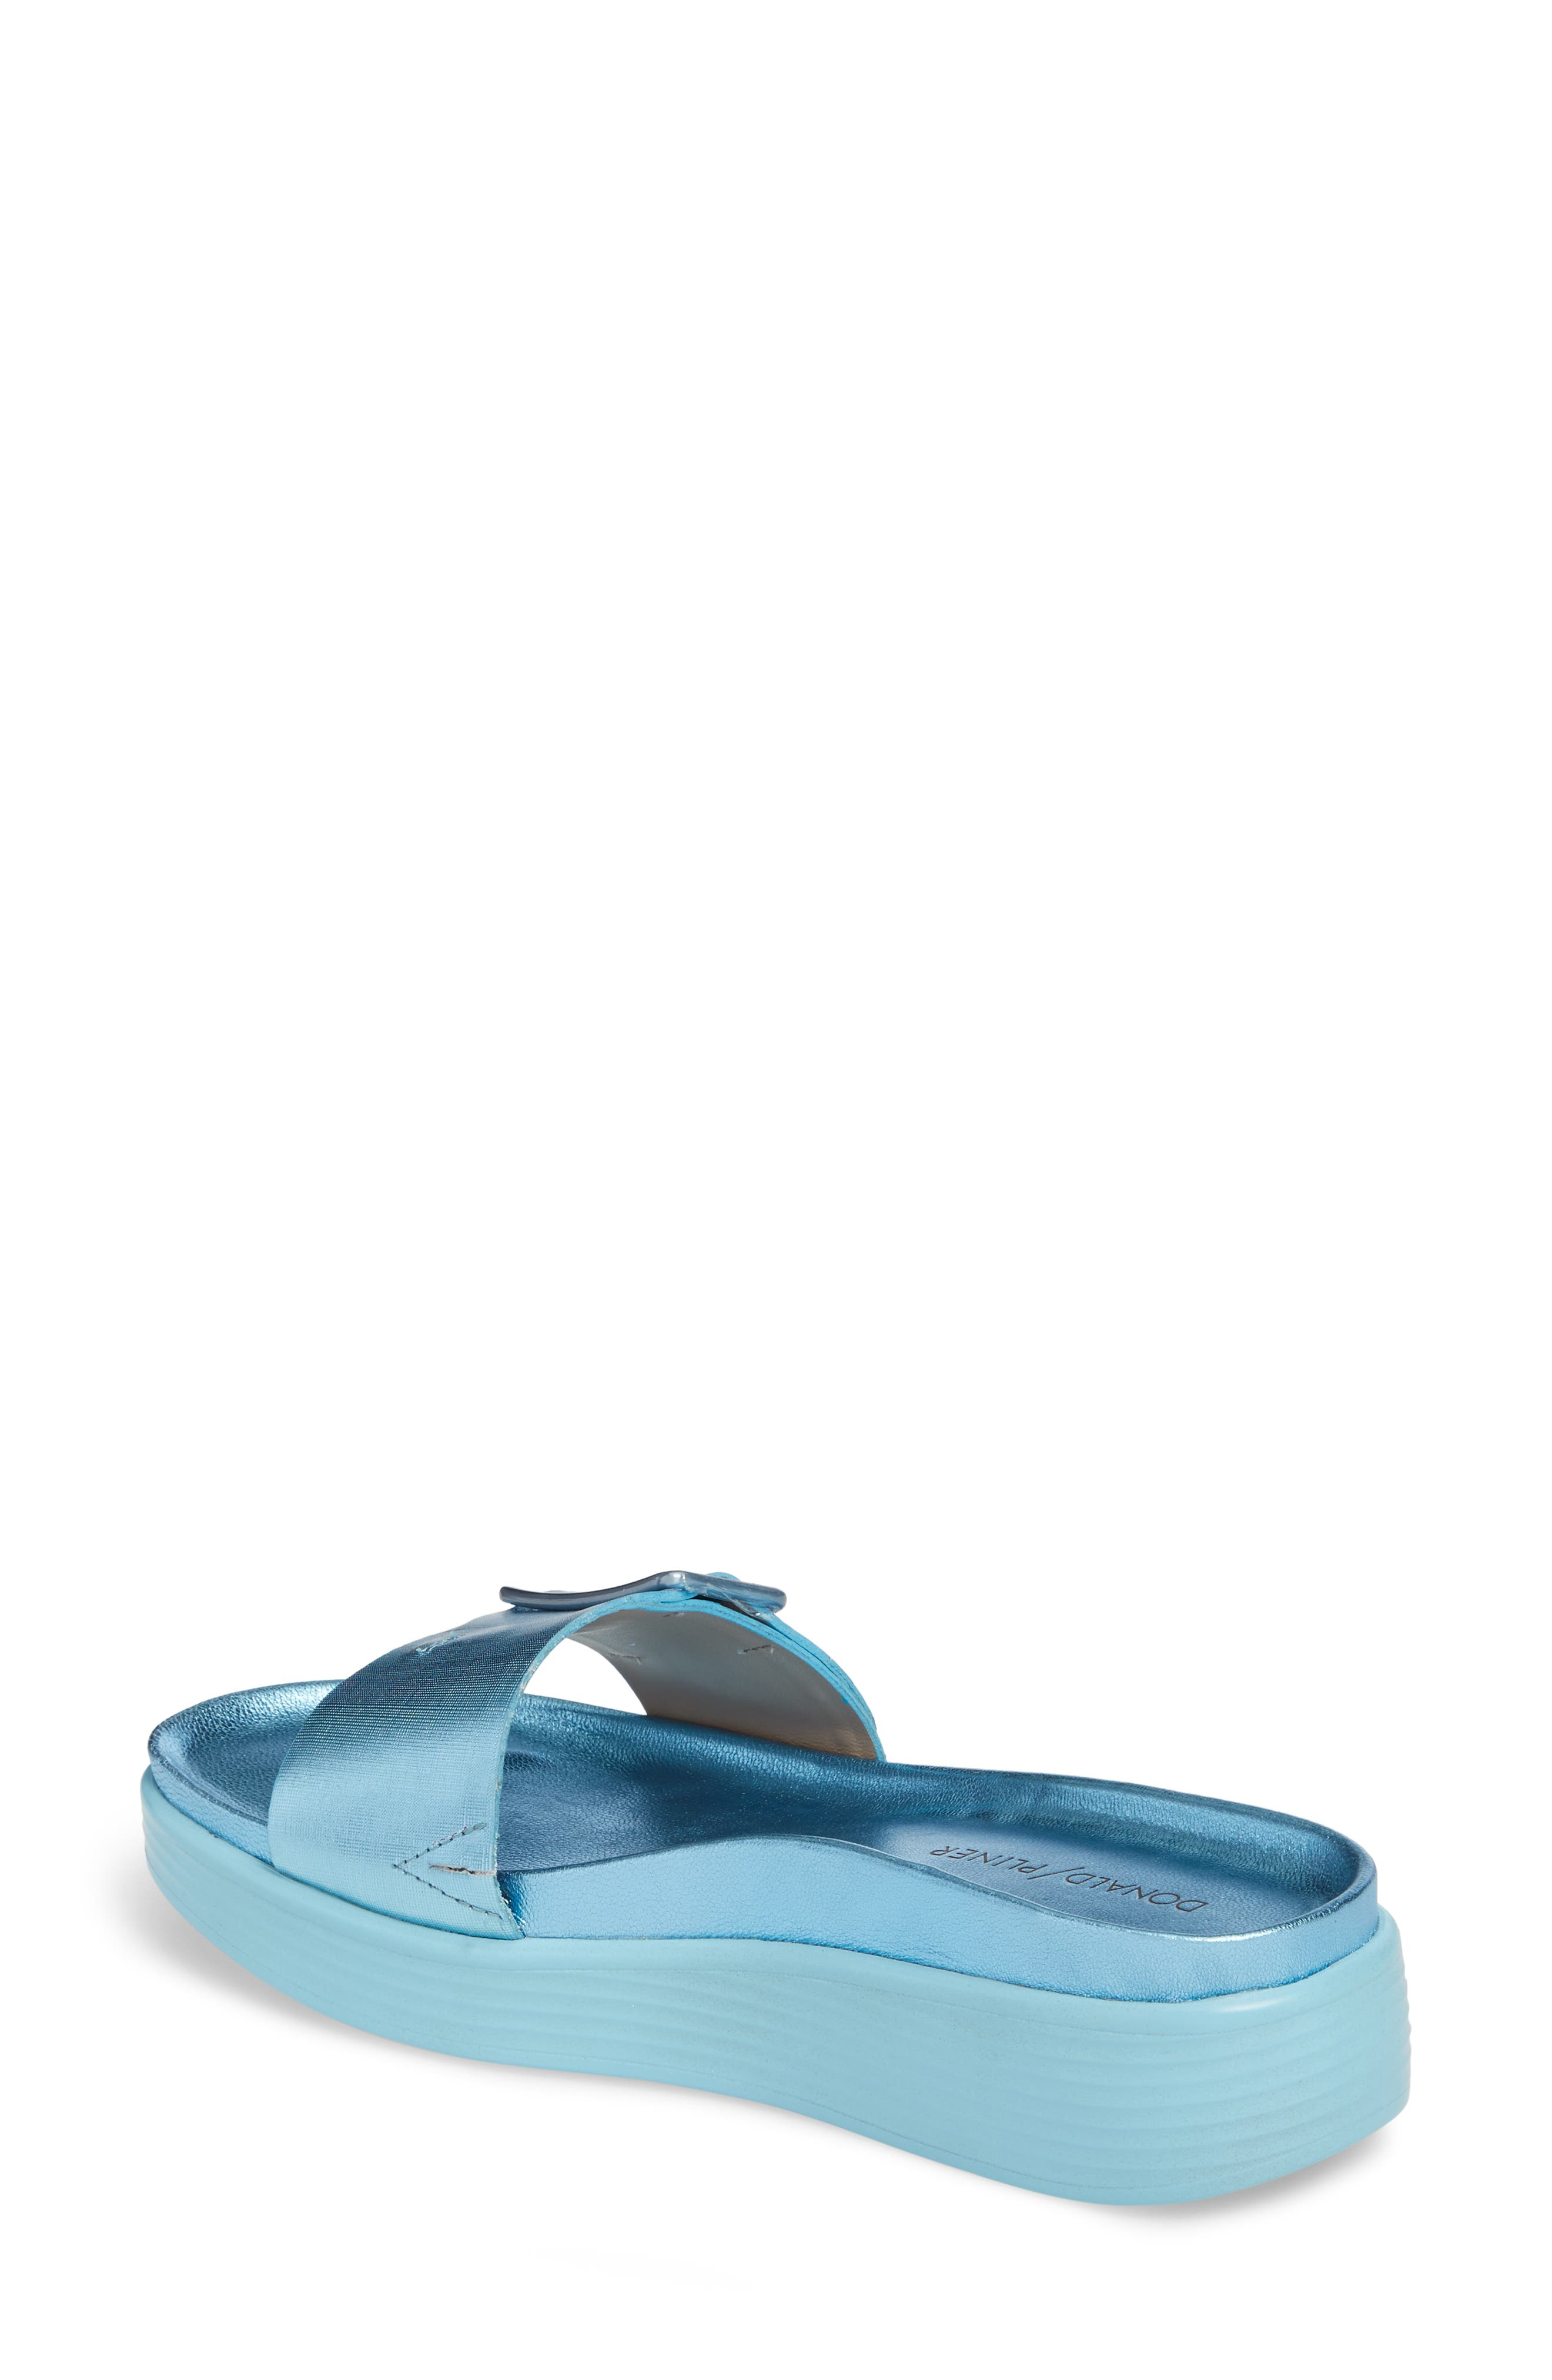 Alternate Image 2  - Donald Pliner Fara Platform Slide Sandal (Women)